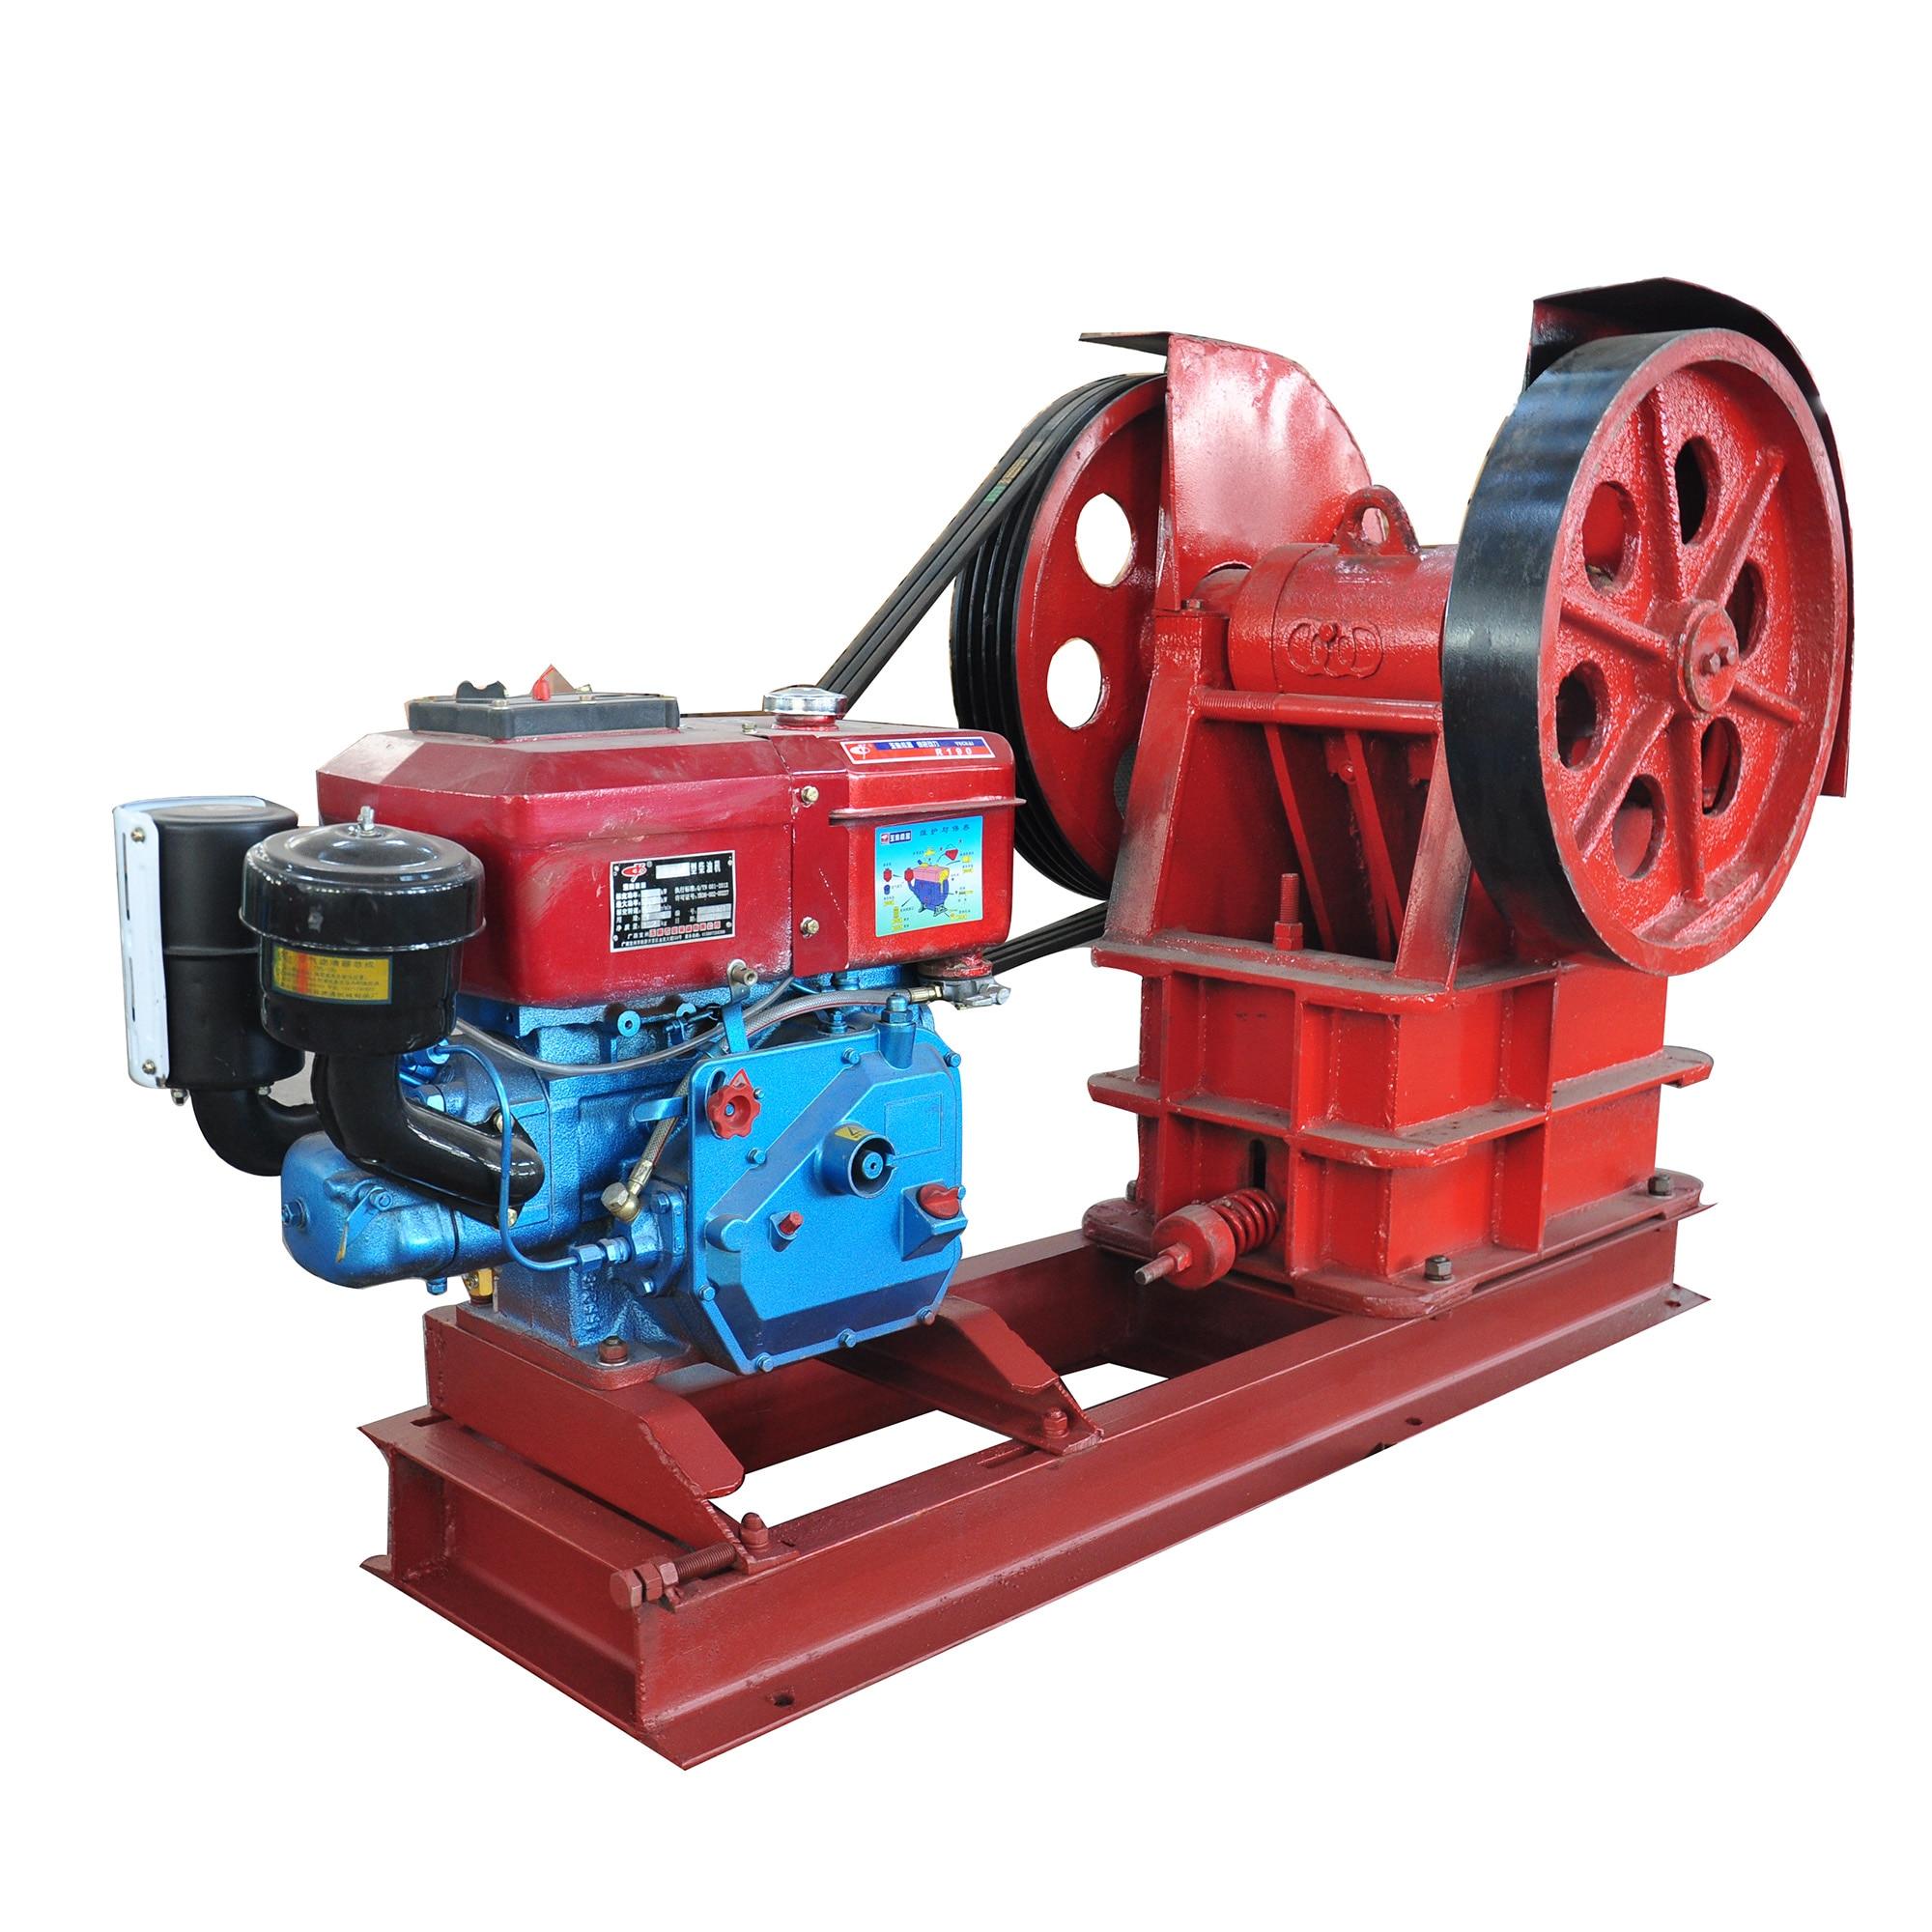 PE-150x250 Dual Power Electric Motor Diesel Motor Big Stone Jaw Crusher Crushing Machine For Stones Coal Maganetic